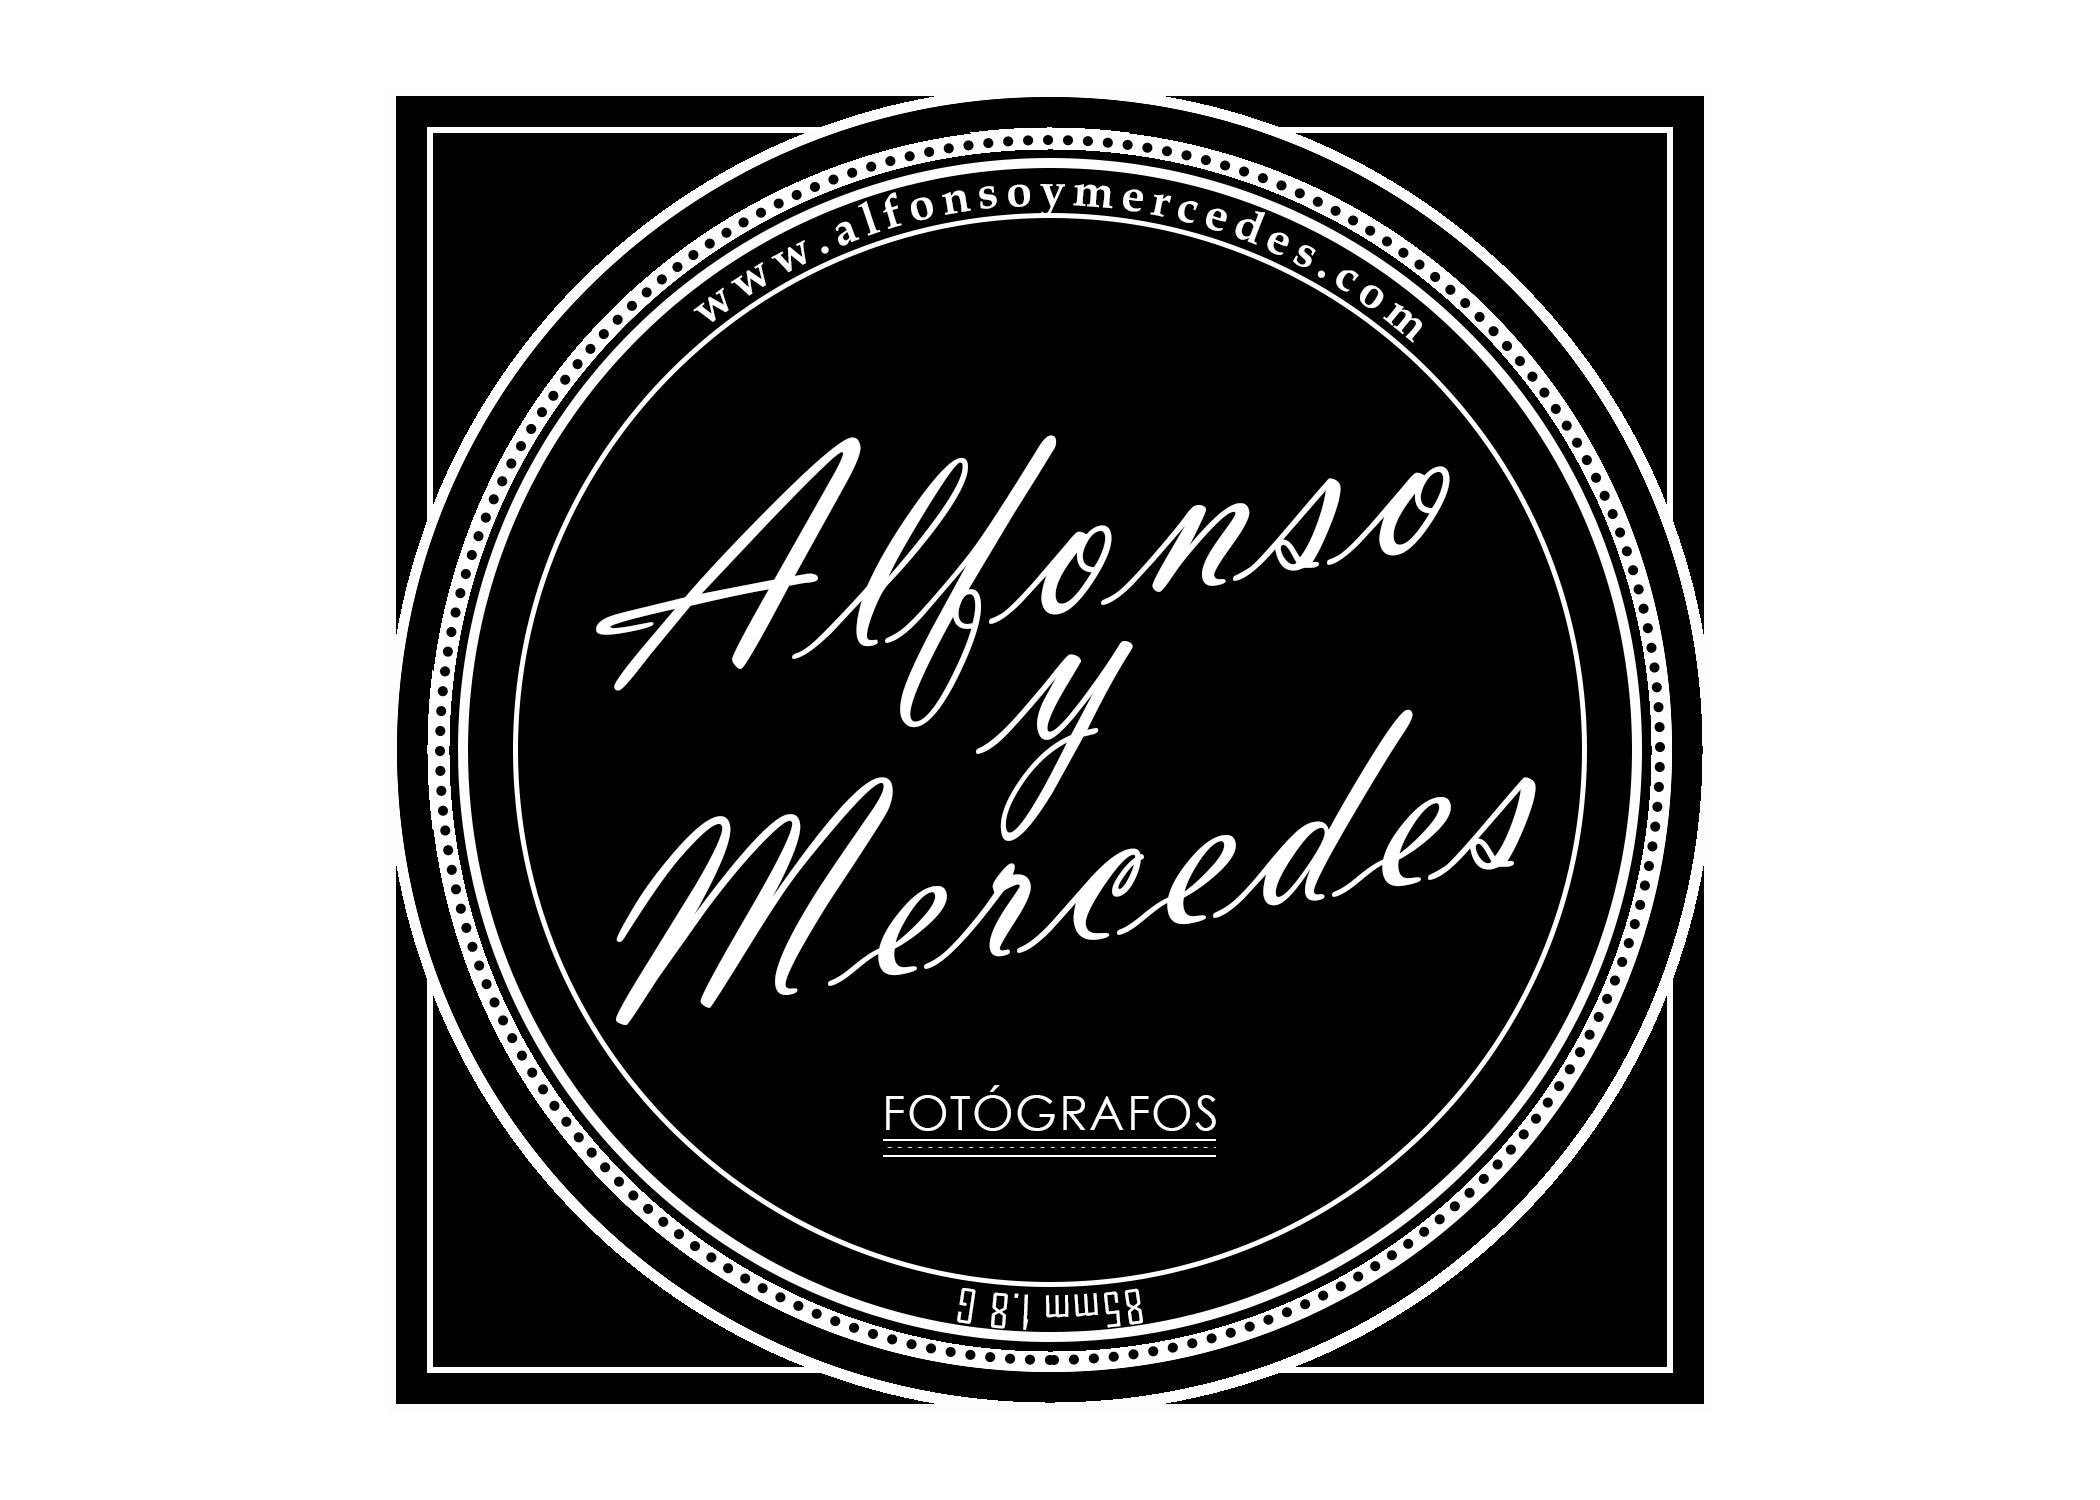 Logo AlfonsoyMercedes Fotógrafos